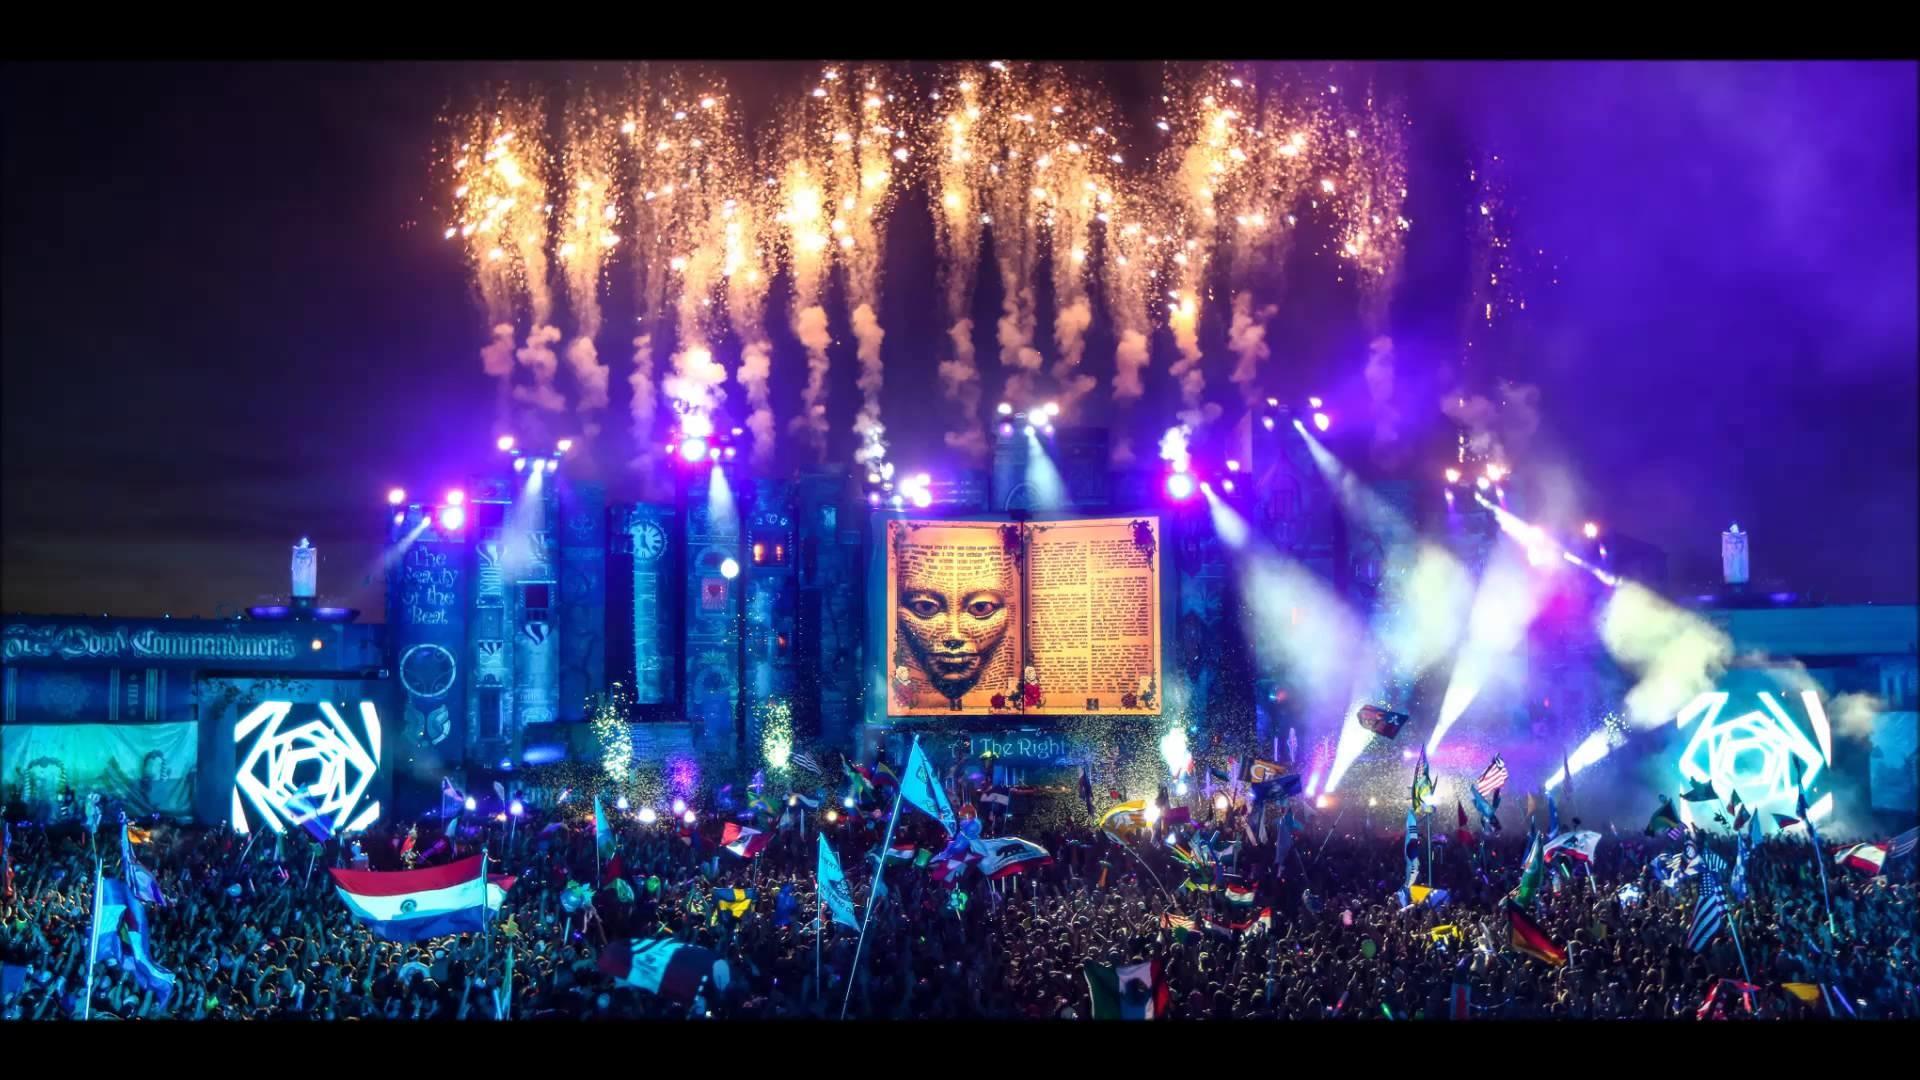 Best Tomorrowland and Airbeat One Mix 2015 (EDM FESTIVAL MEGA MIX) !!!!!! –  YouTube